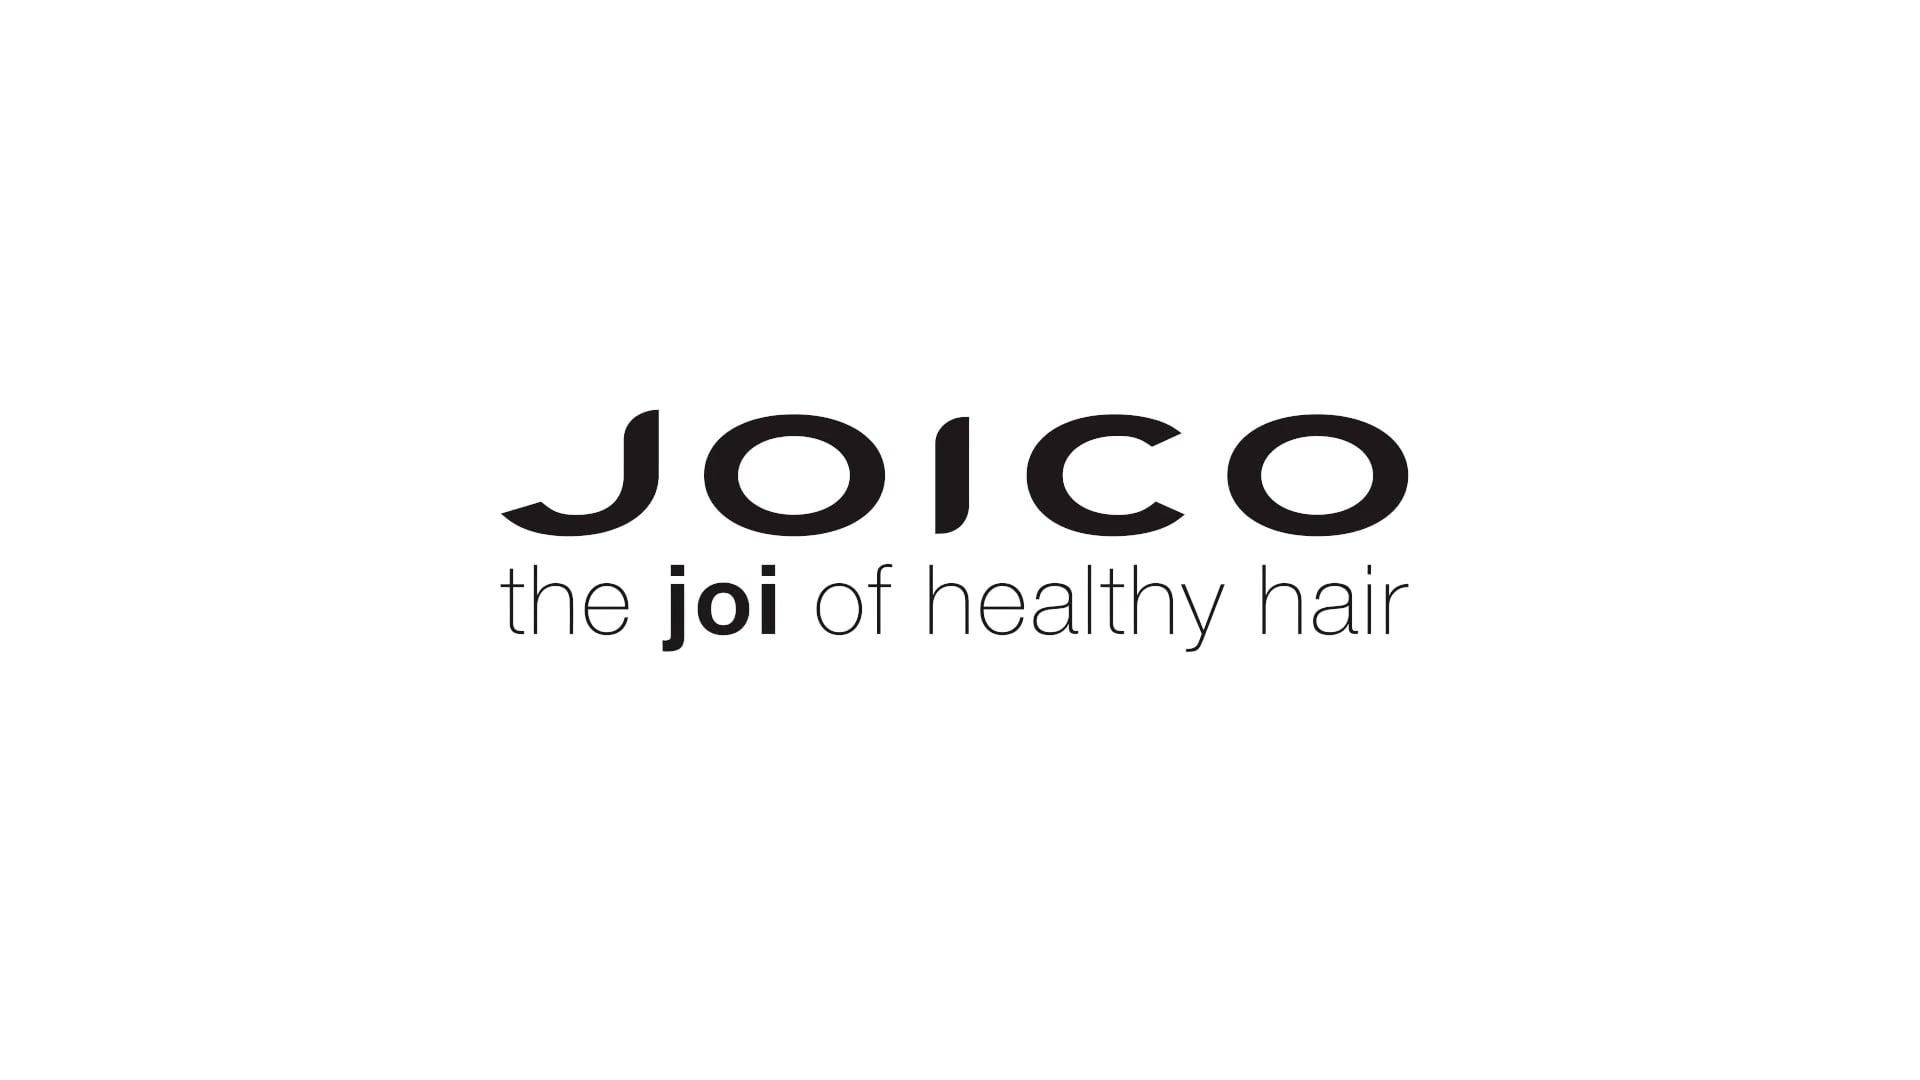 Joico Defy Damage - Promotional Video